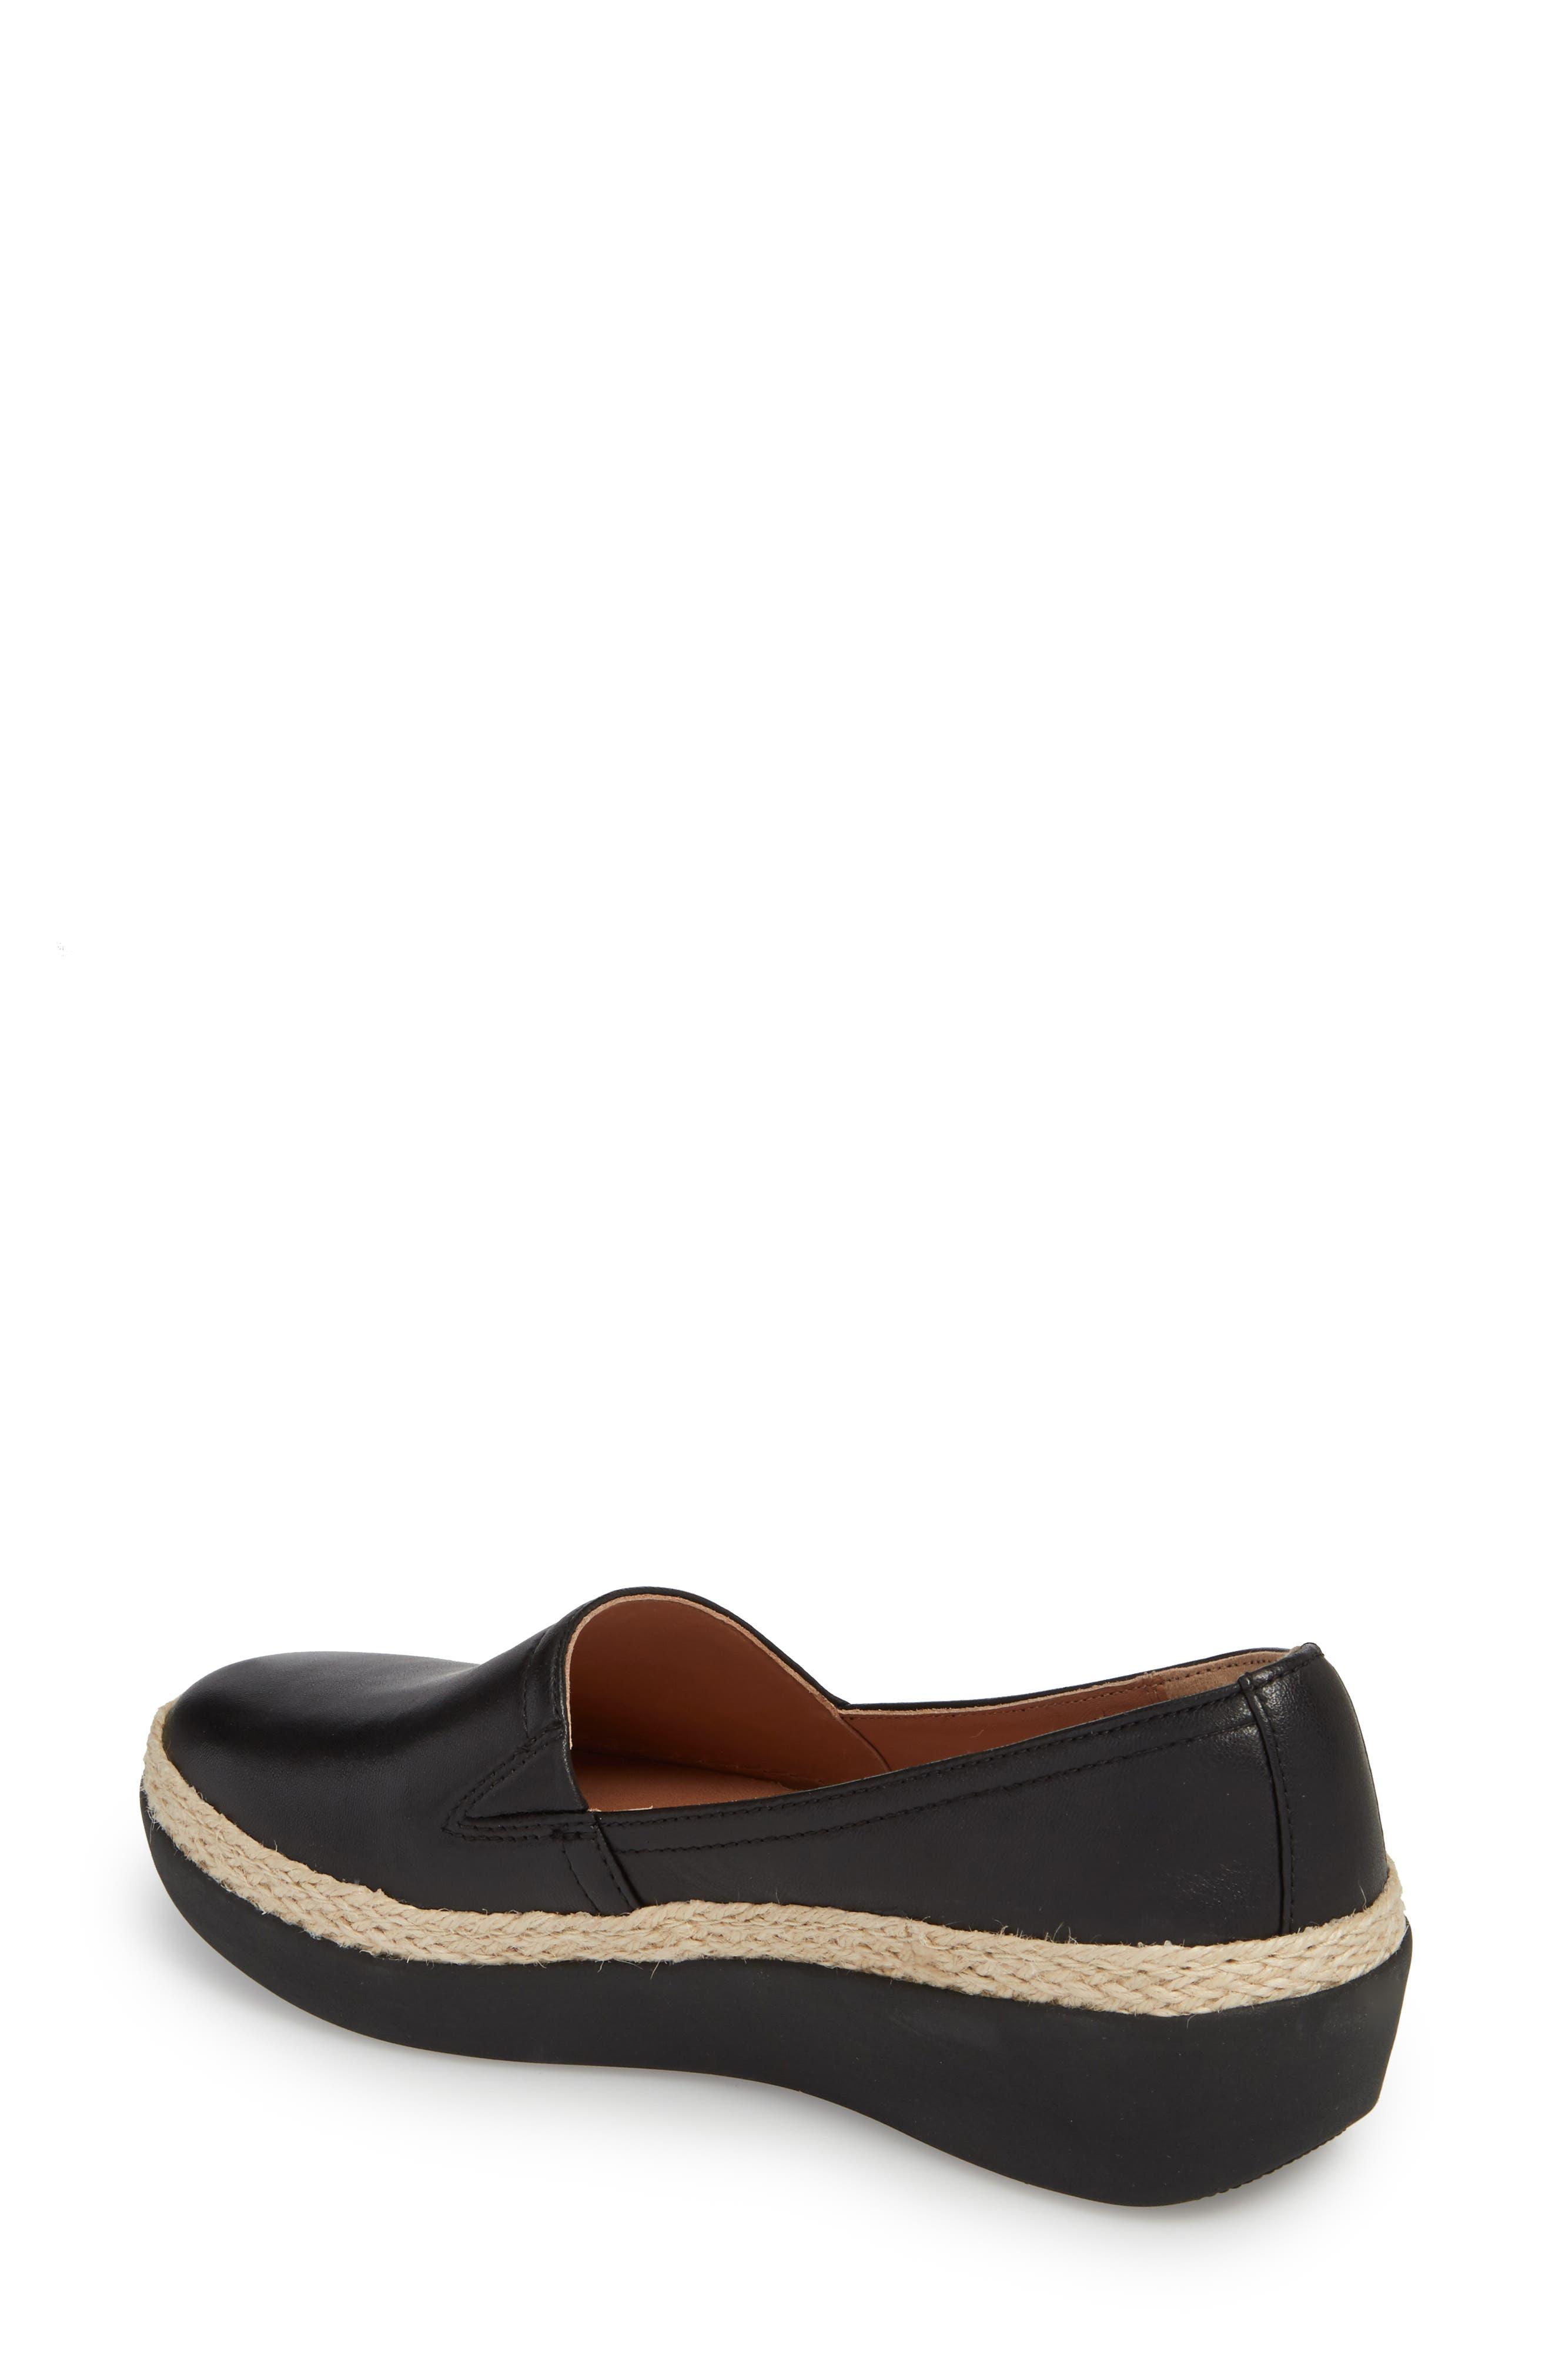 Casa Loafer,                             Alternate thumbnail 2, color,                             Black Leather